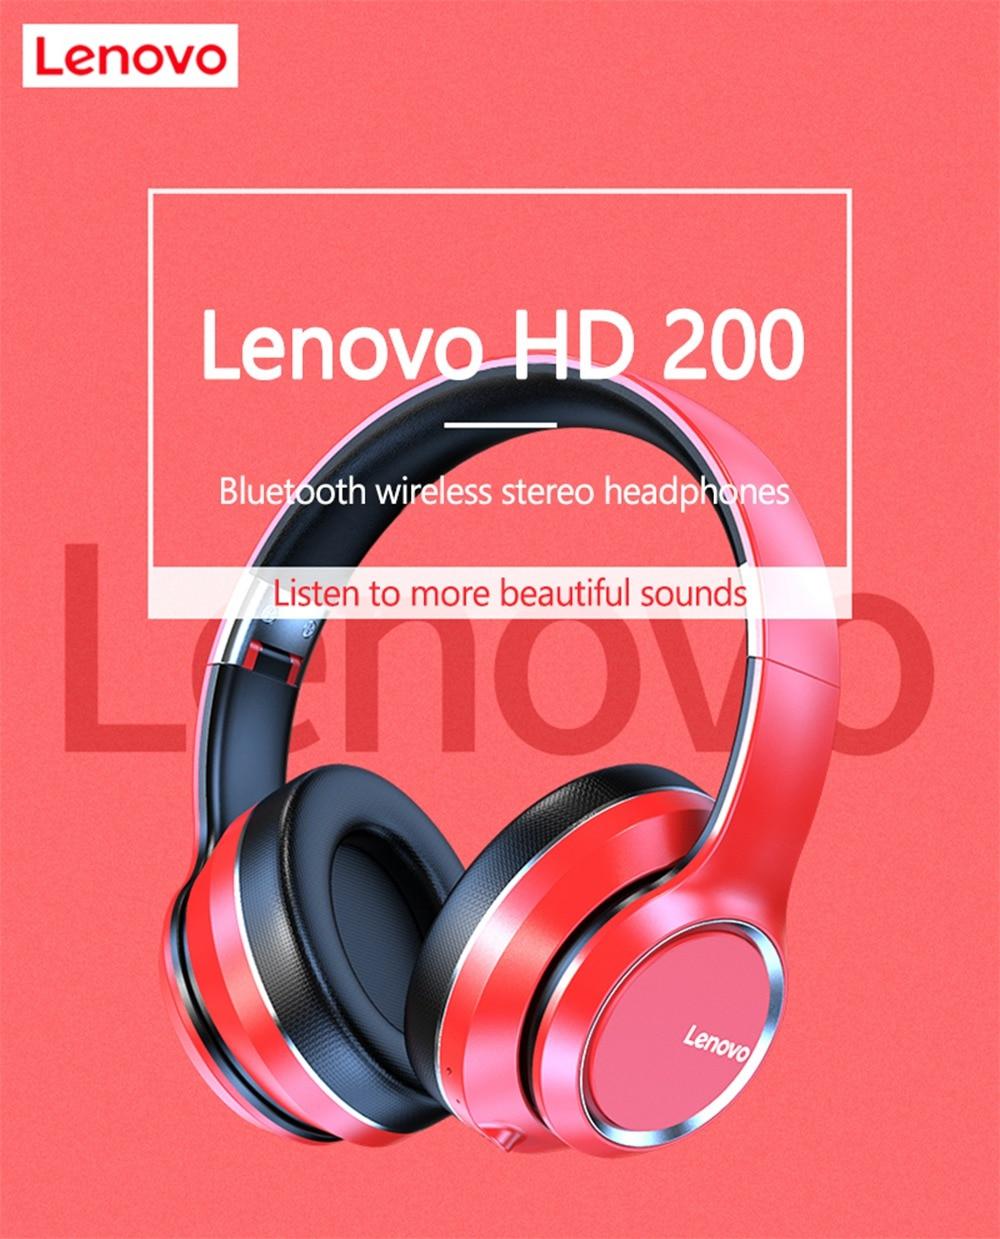 Lenovo HD200 Bluetooth Draadloze Stereo Hoofdtelefoon BT5.0 Lange Standby Leven Met Noise Cancelling Voor Xiaomi Iphone Lenovo Headset 9